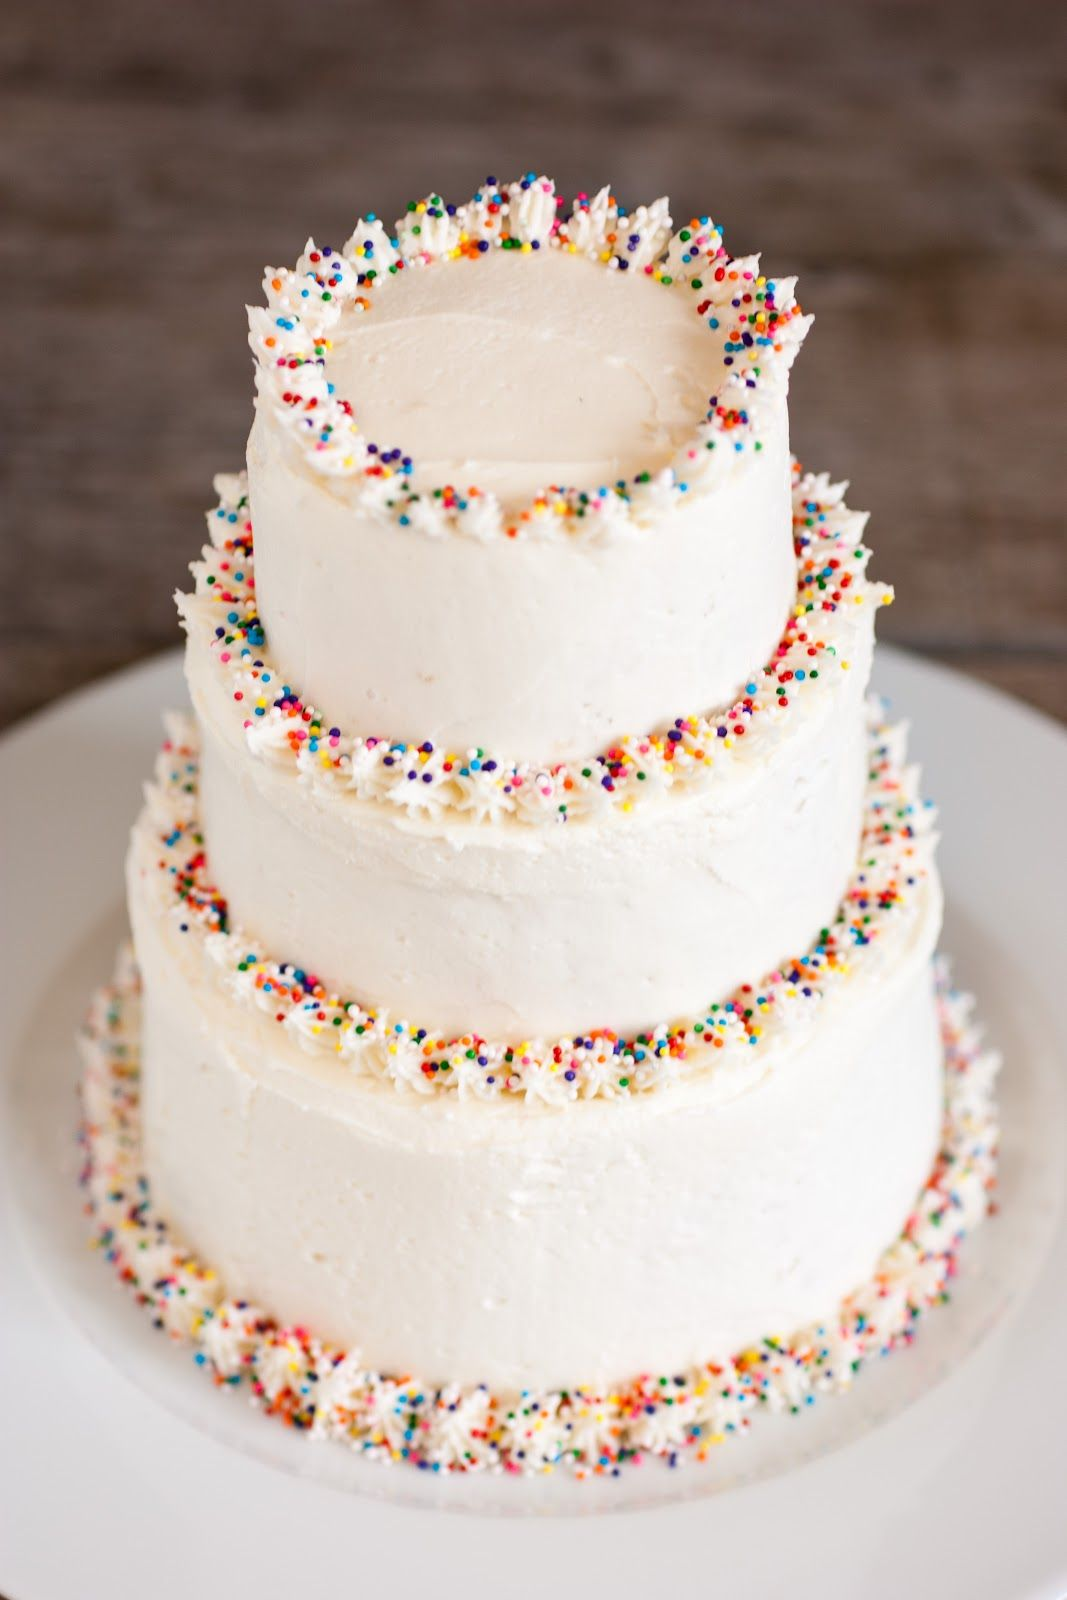 Vanilla cake recipe without icing